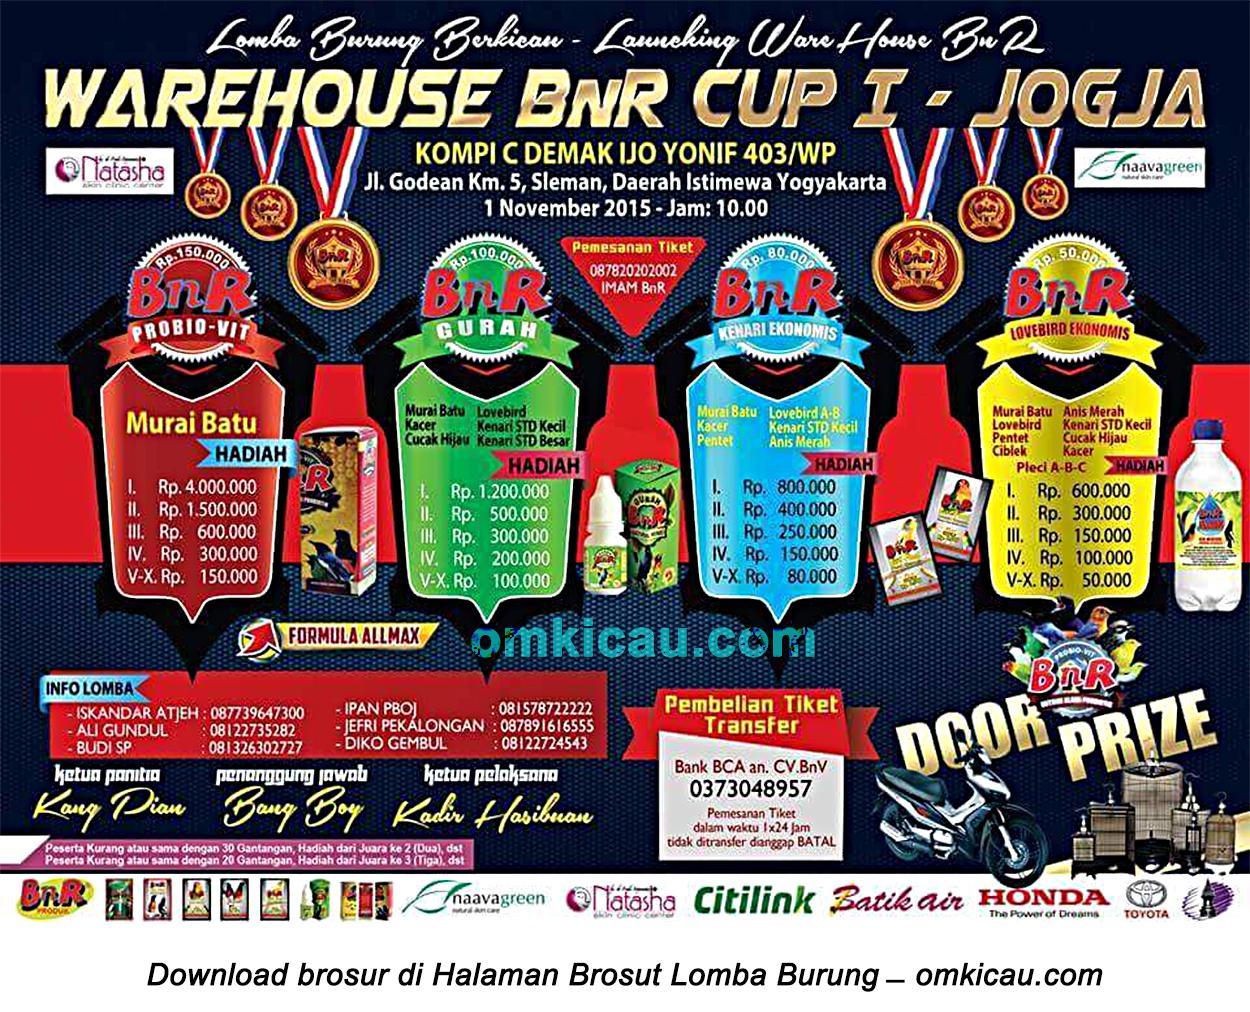 Brosur Lomba Burung Berkicau Warehouse BnR Cup I, Jogja, 1 November 2015